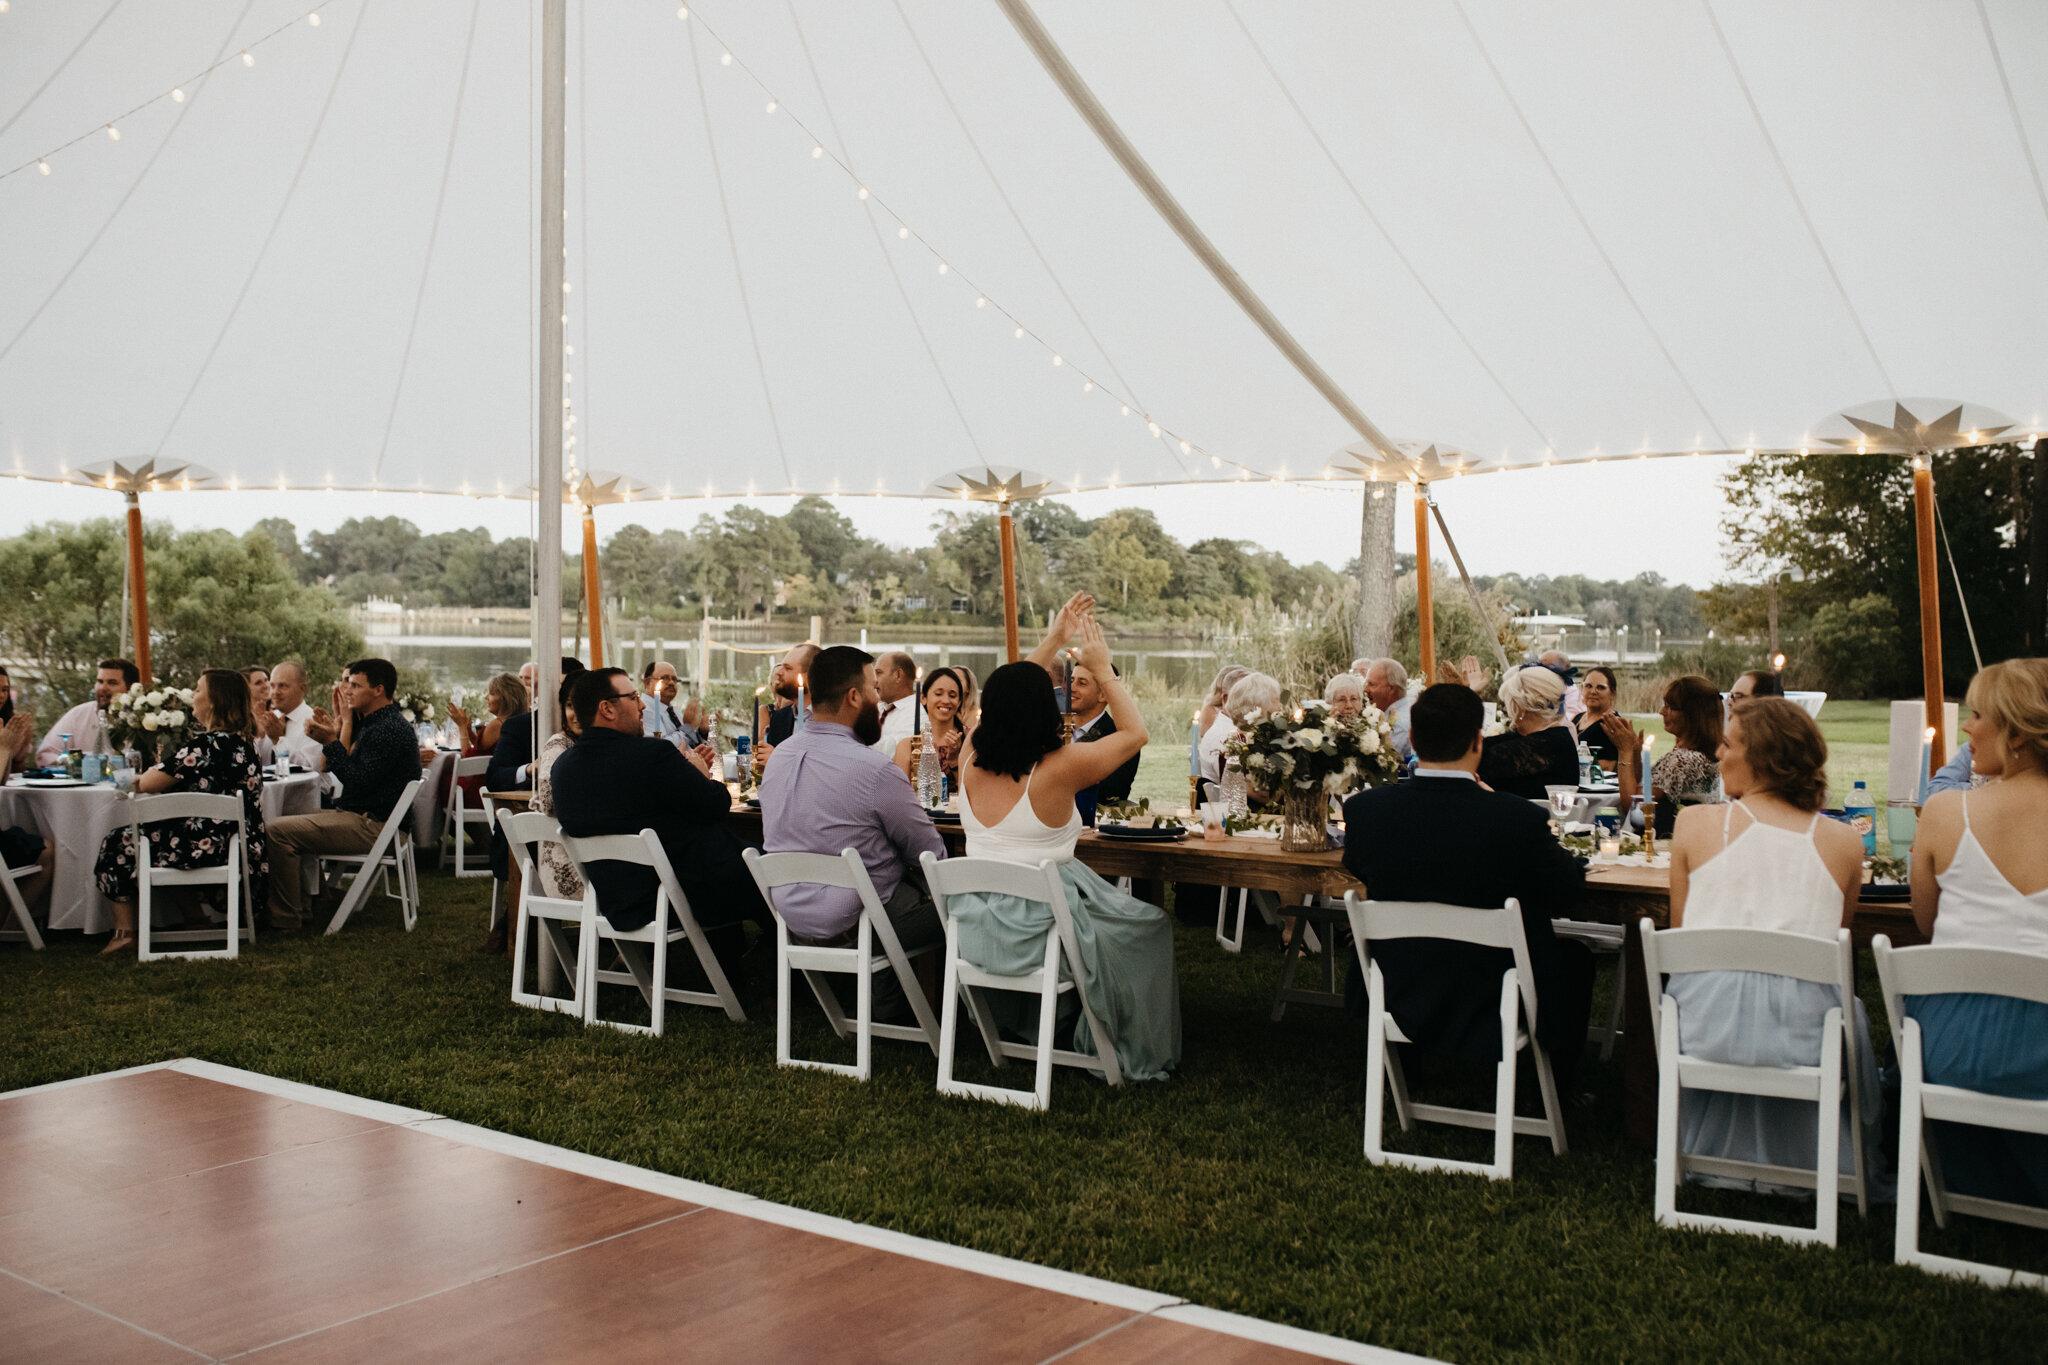 angela_jason_norfolk_wedding-142.jpg